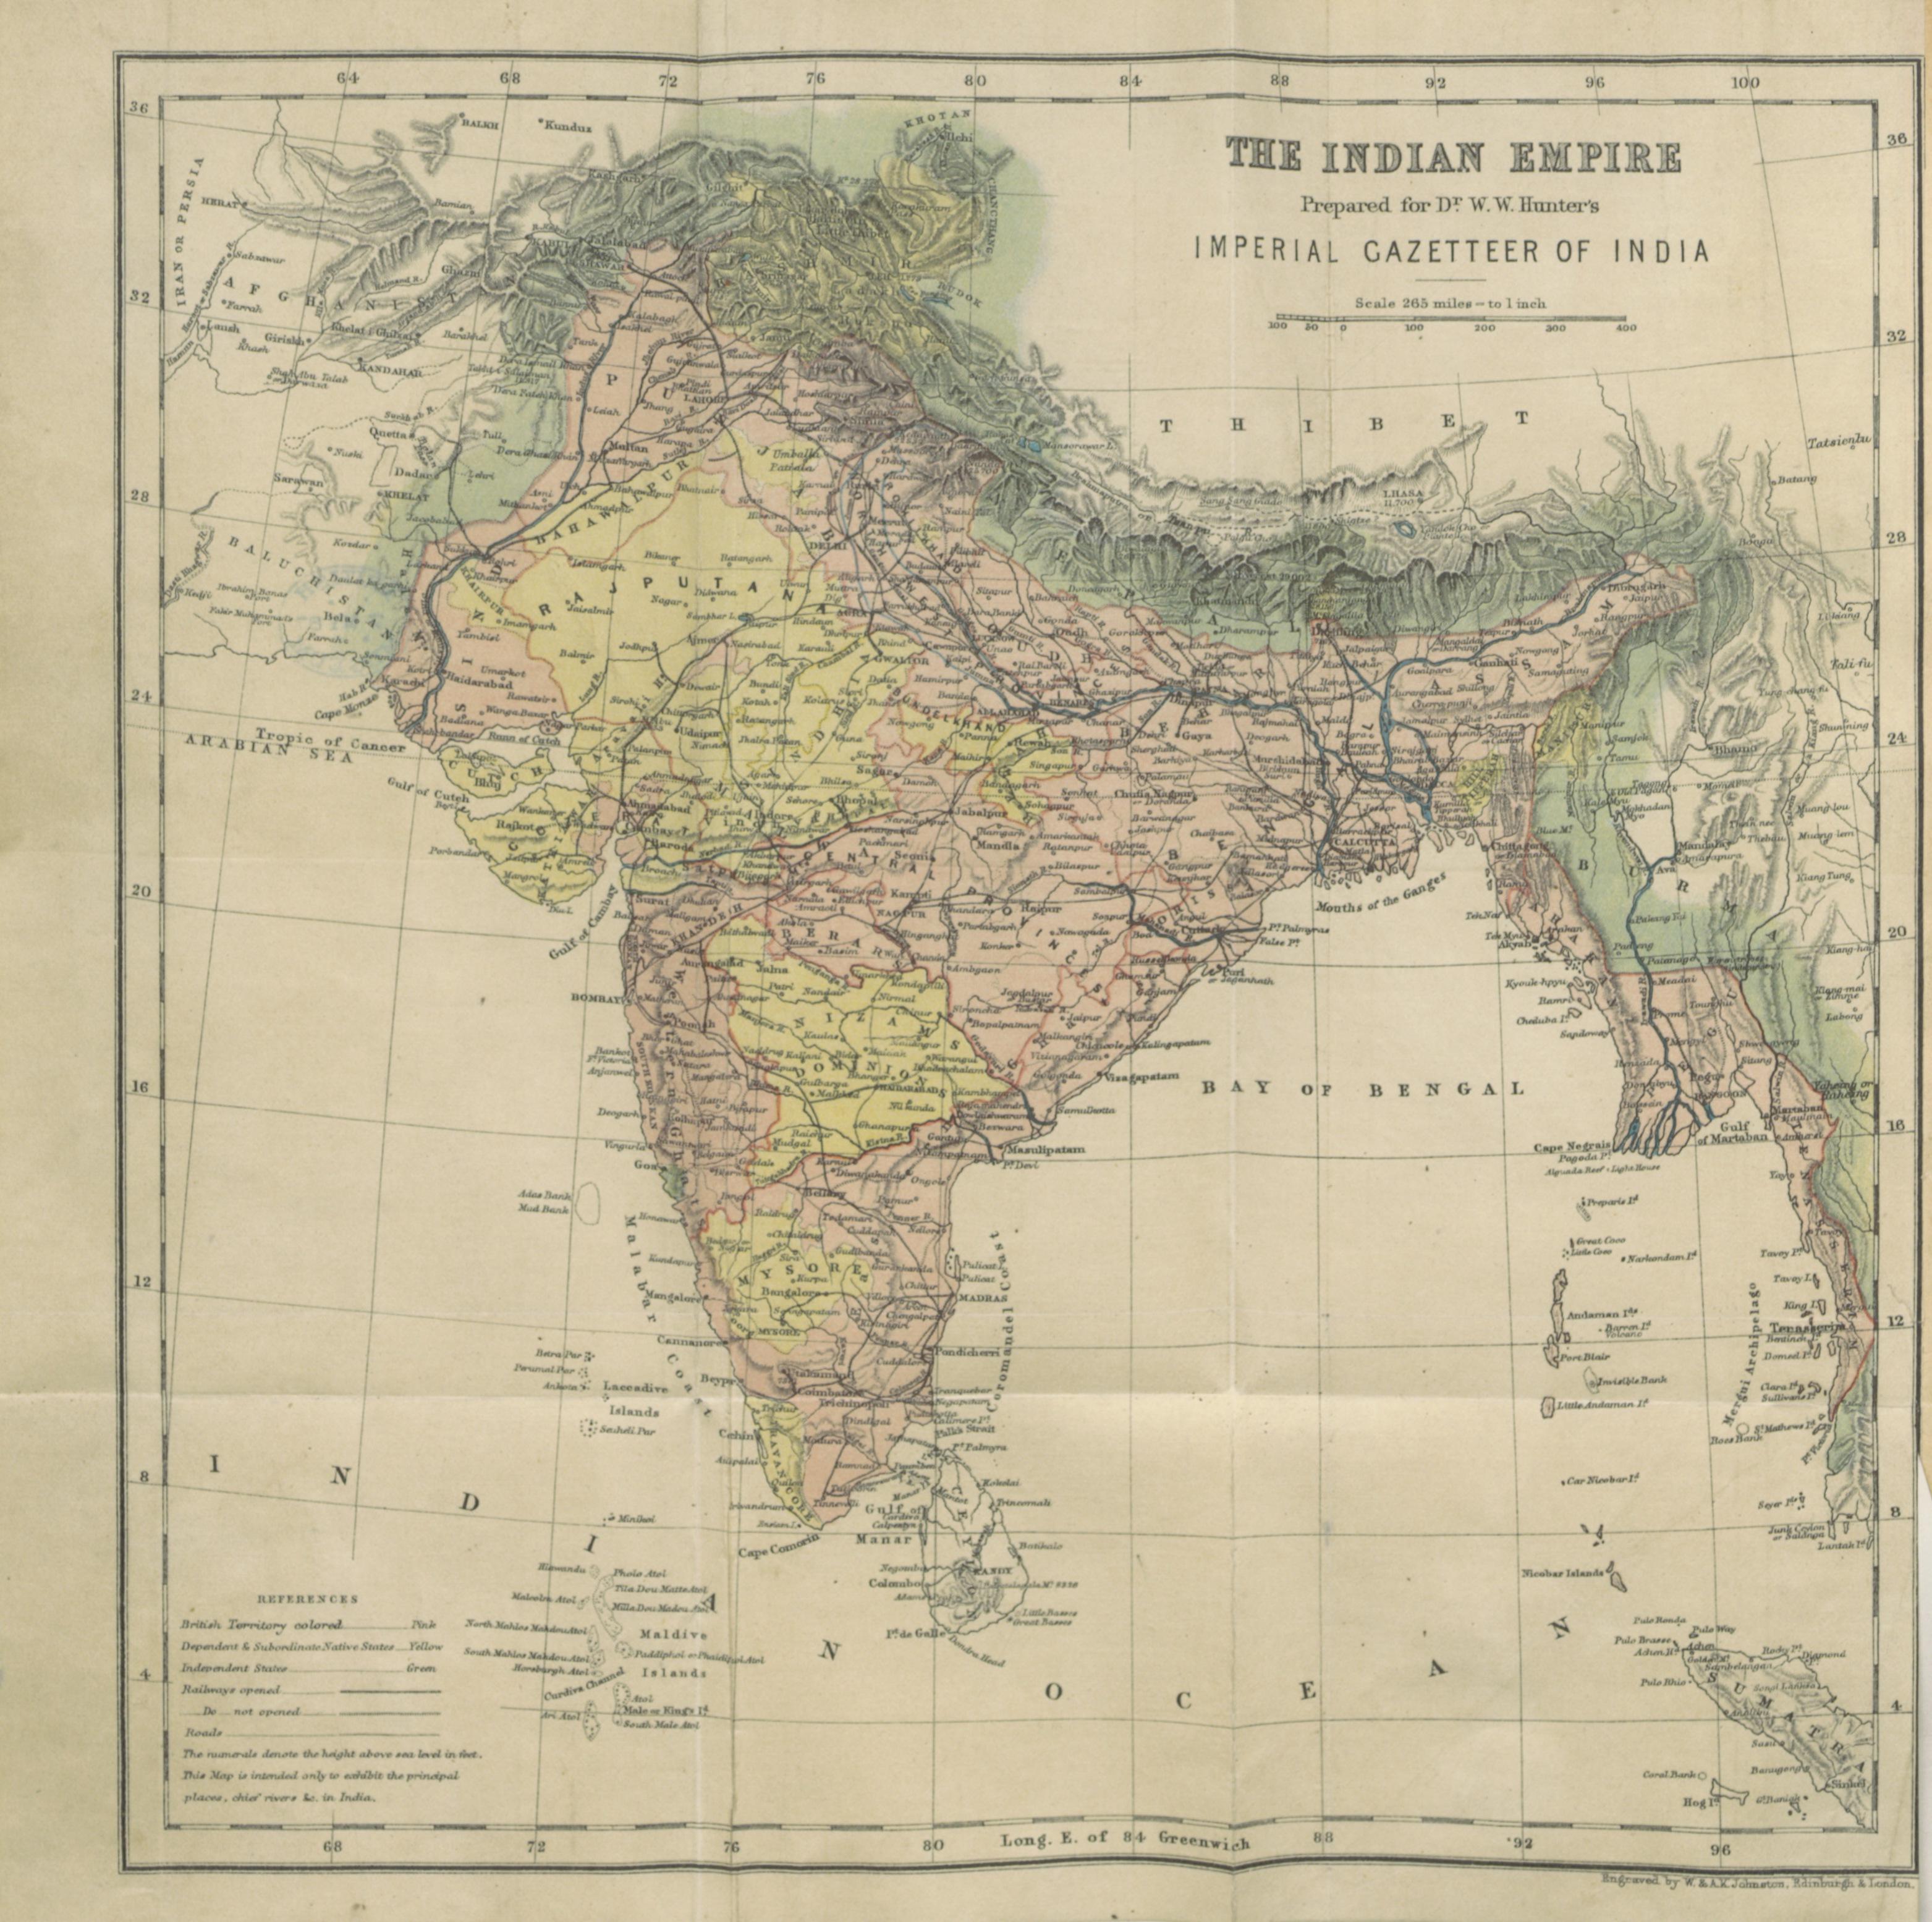 The Imperial Gazetteer of India. Volume VI